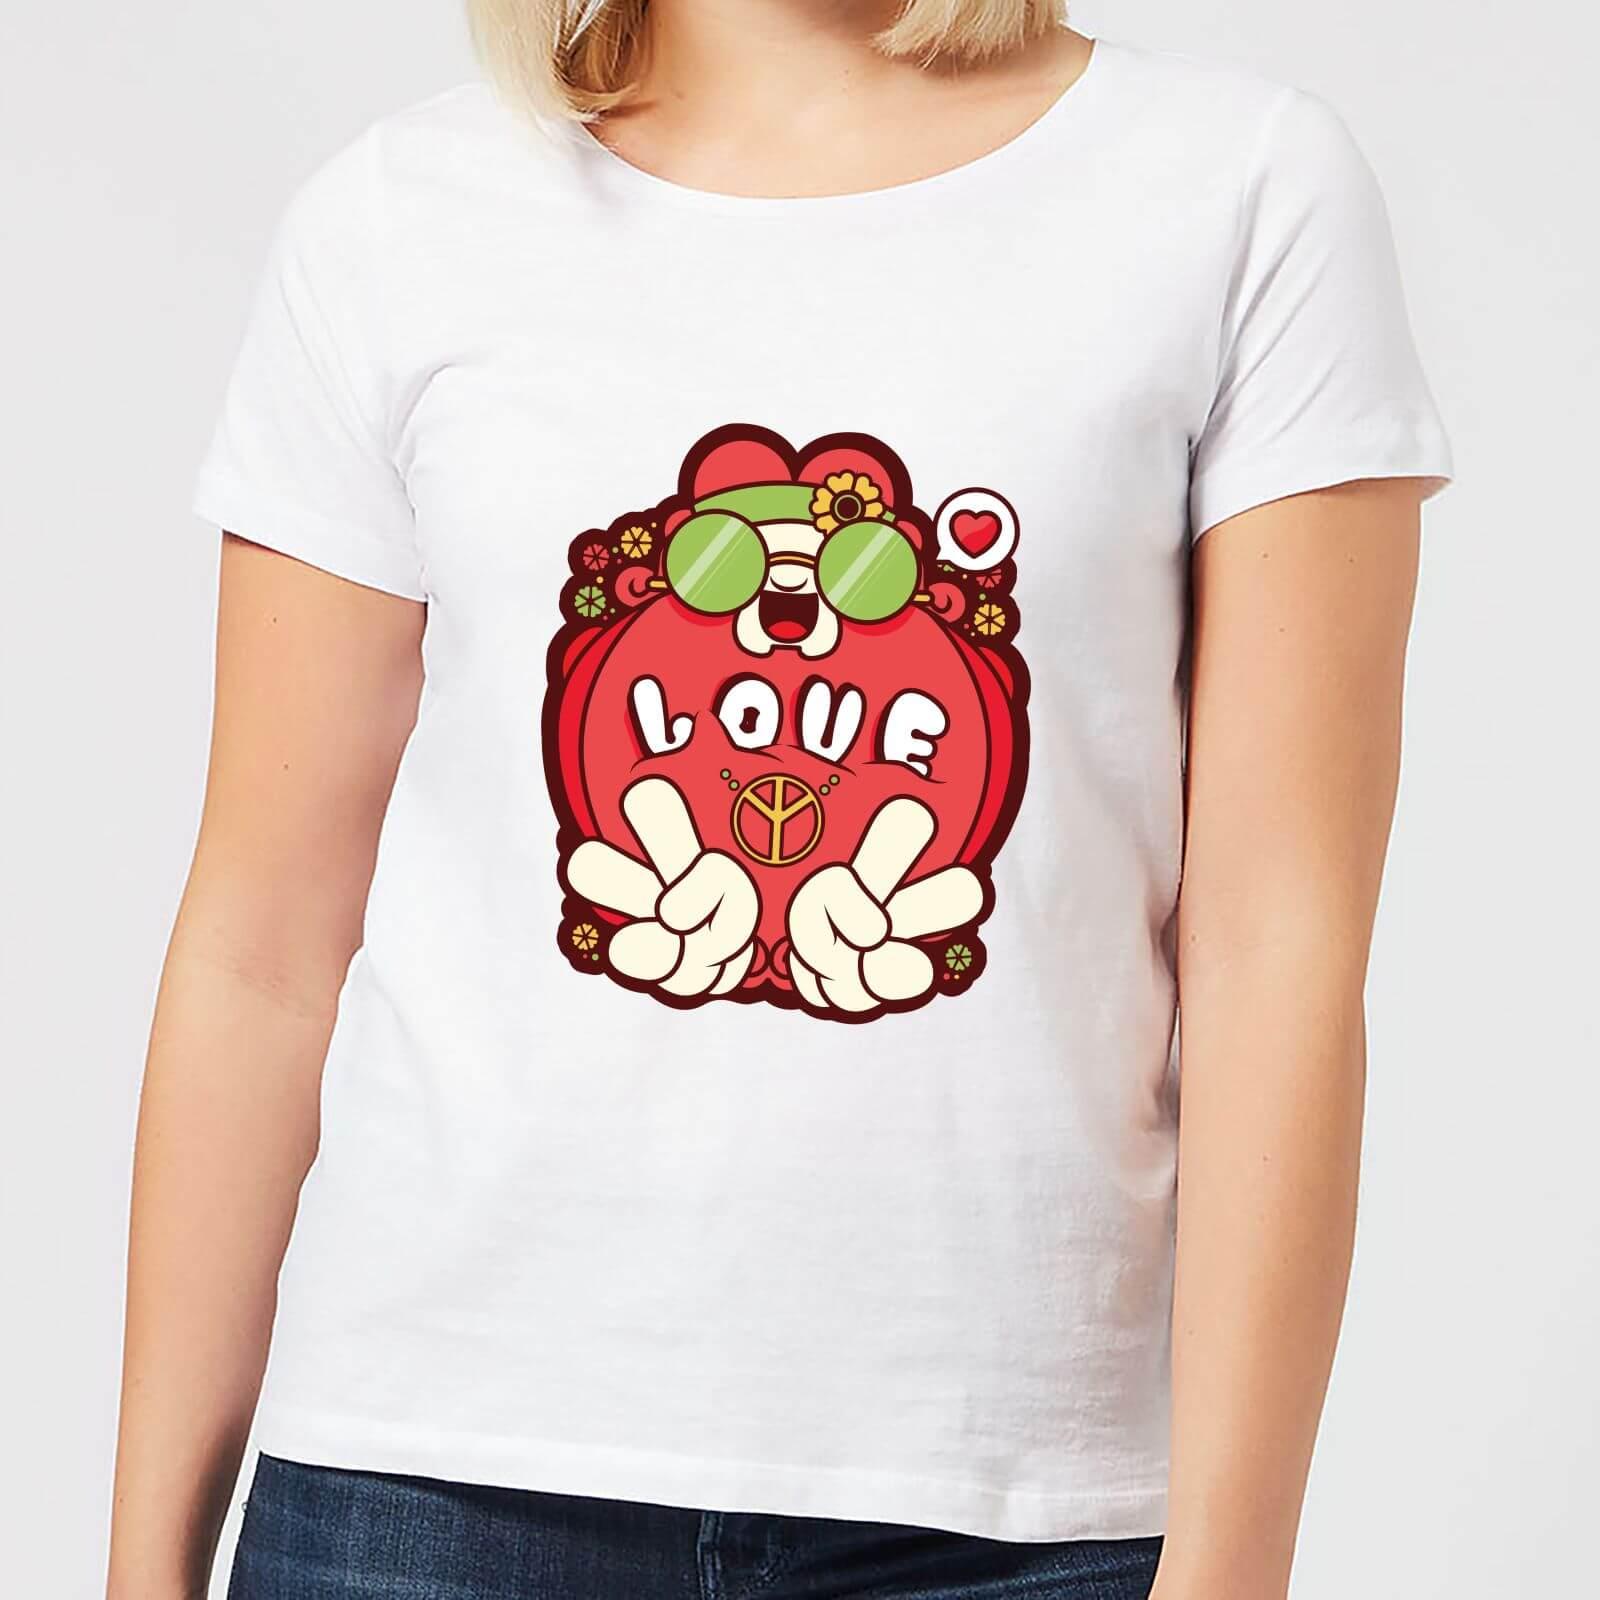 IWOOT Hippie Love Cartoon Women's T-Shirt - White - XL - White